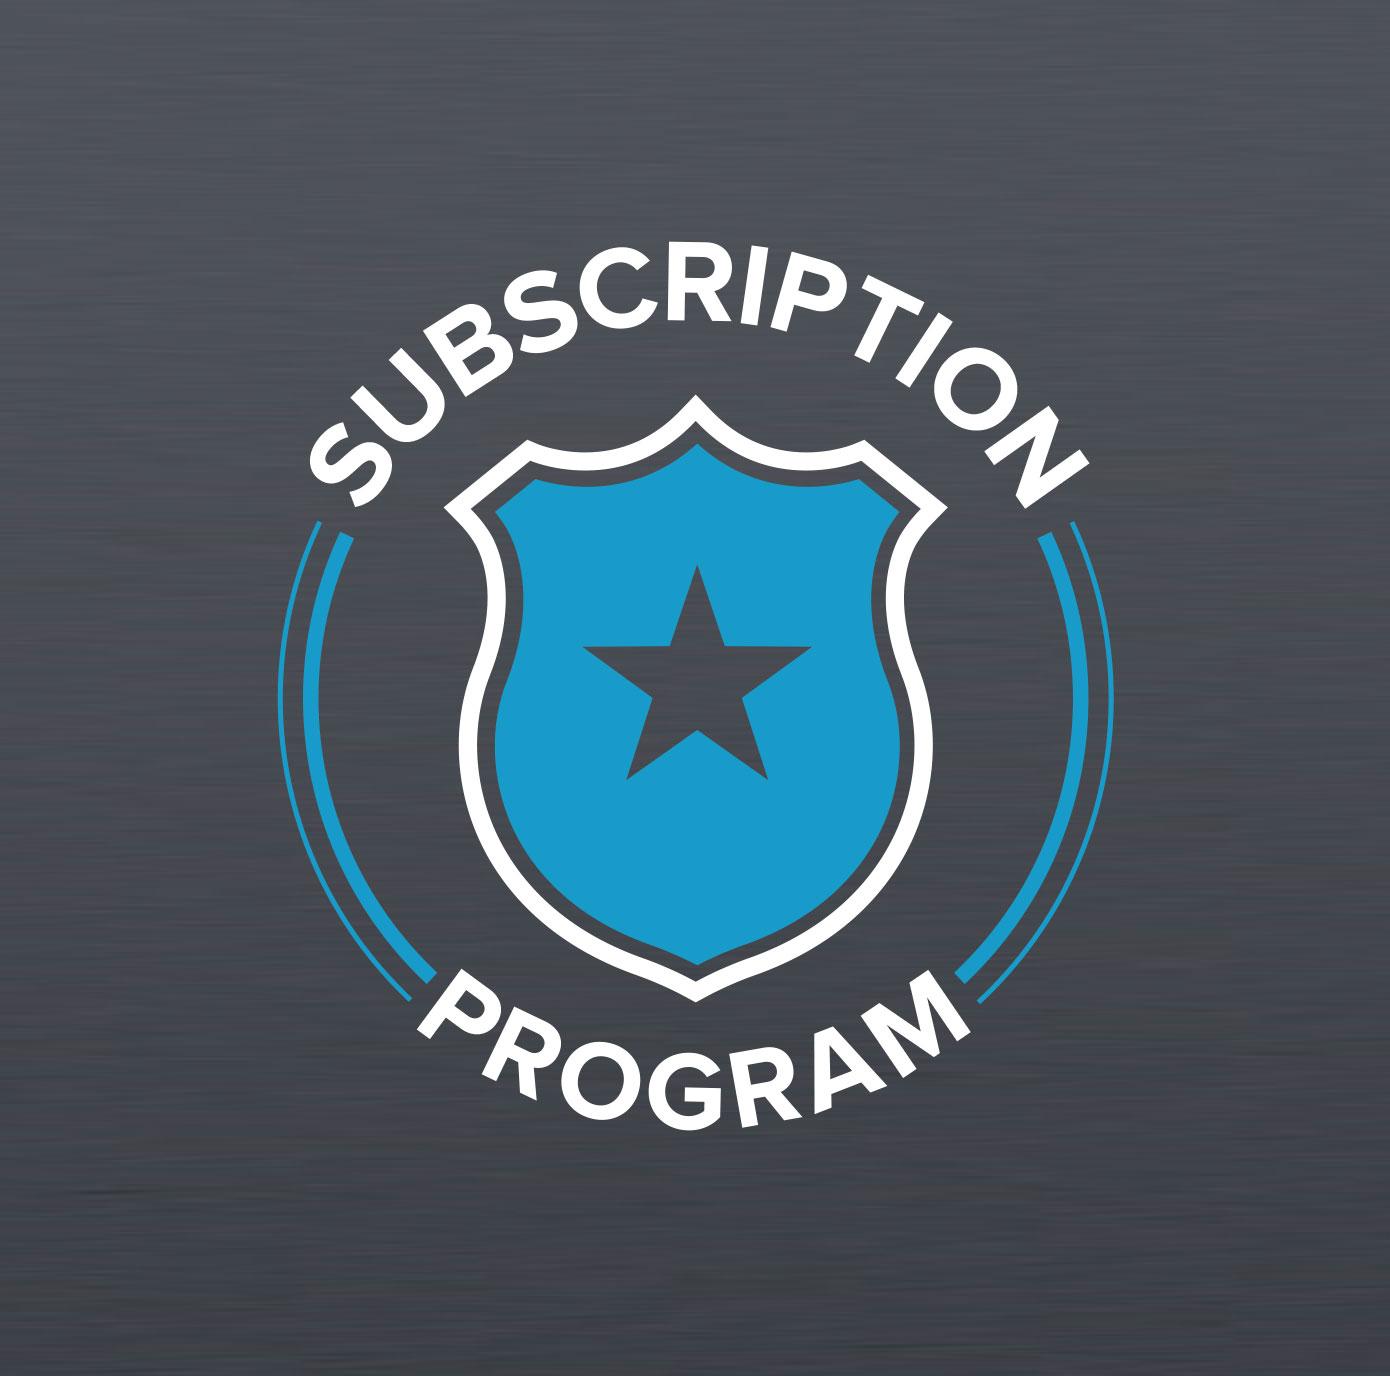 Body-Cam Subscription Program